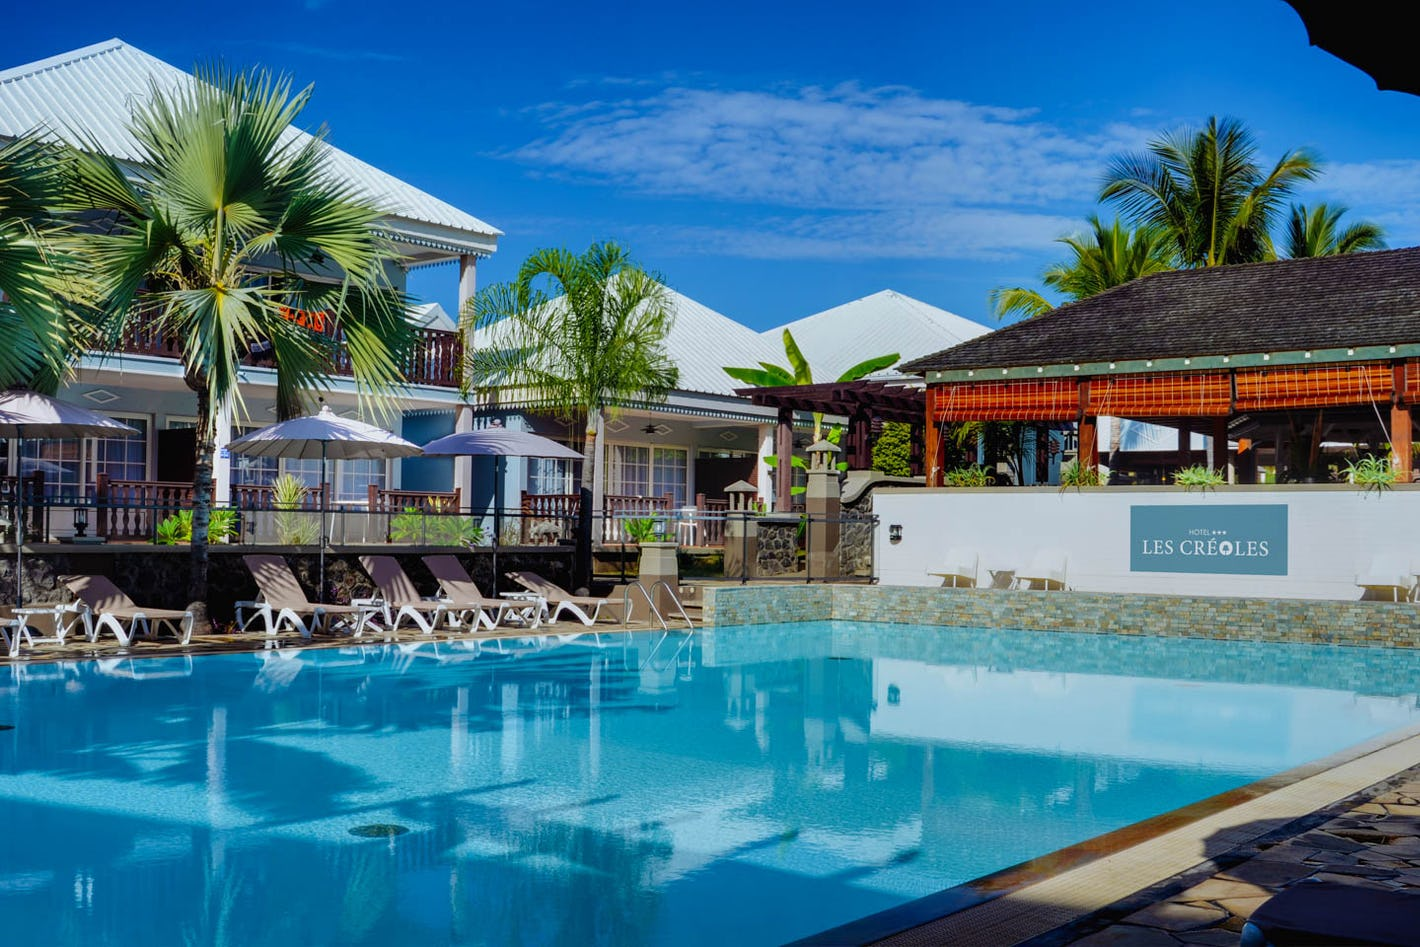 le r cif hotel reunion island timbuktu travel. Black Bedroom Furniture Sets. Home Design Ideas